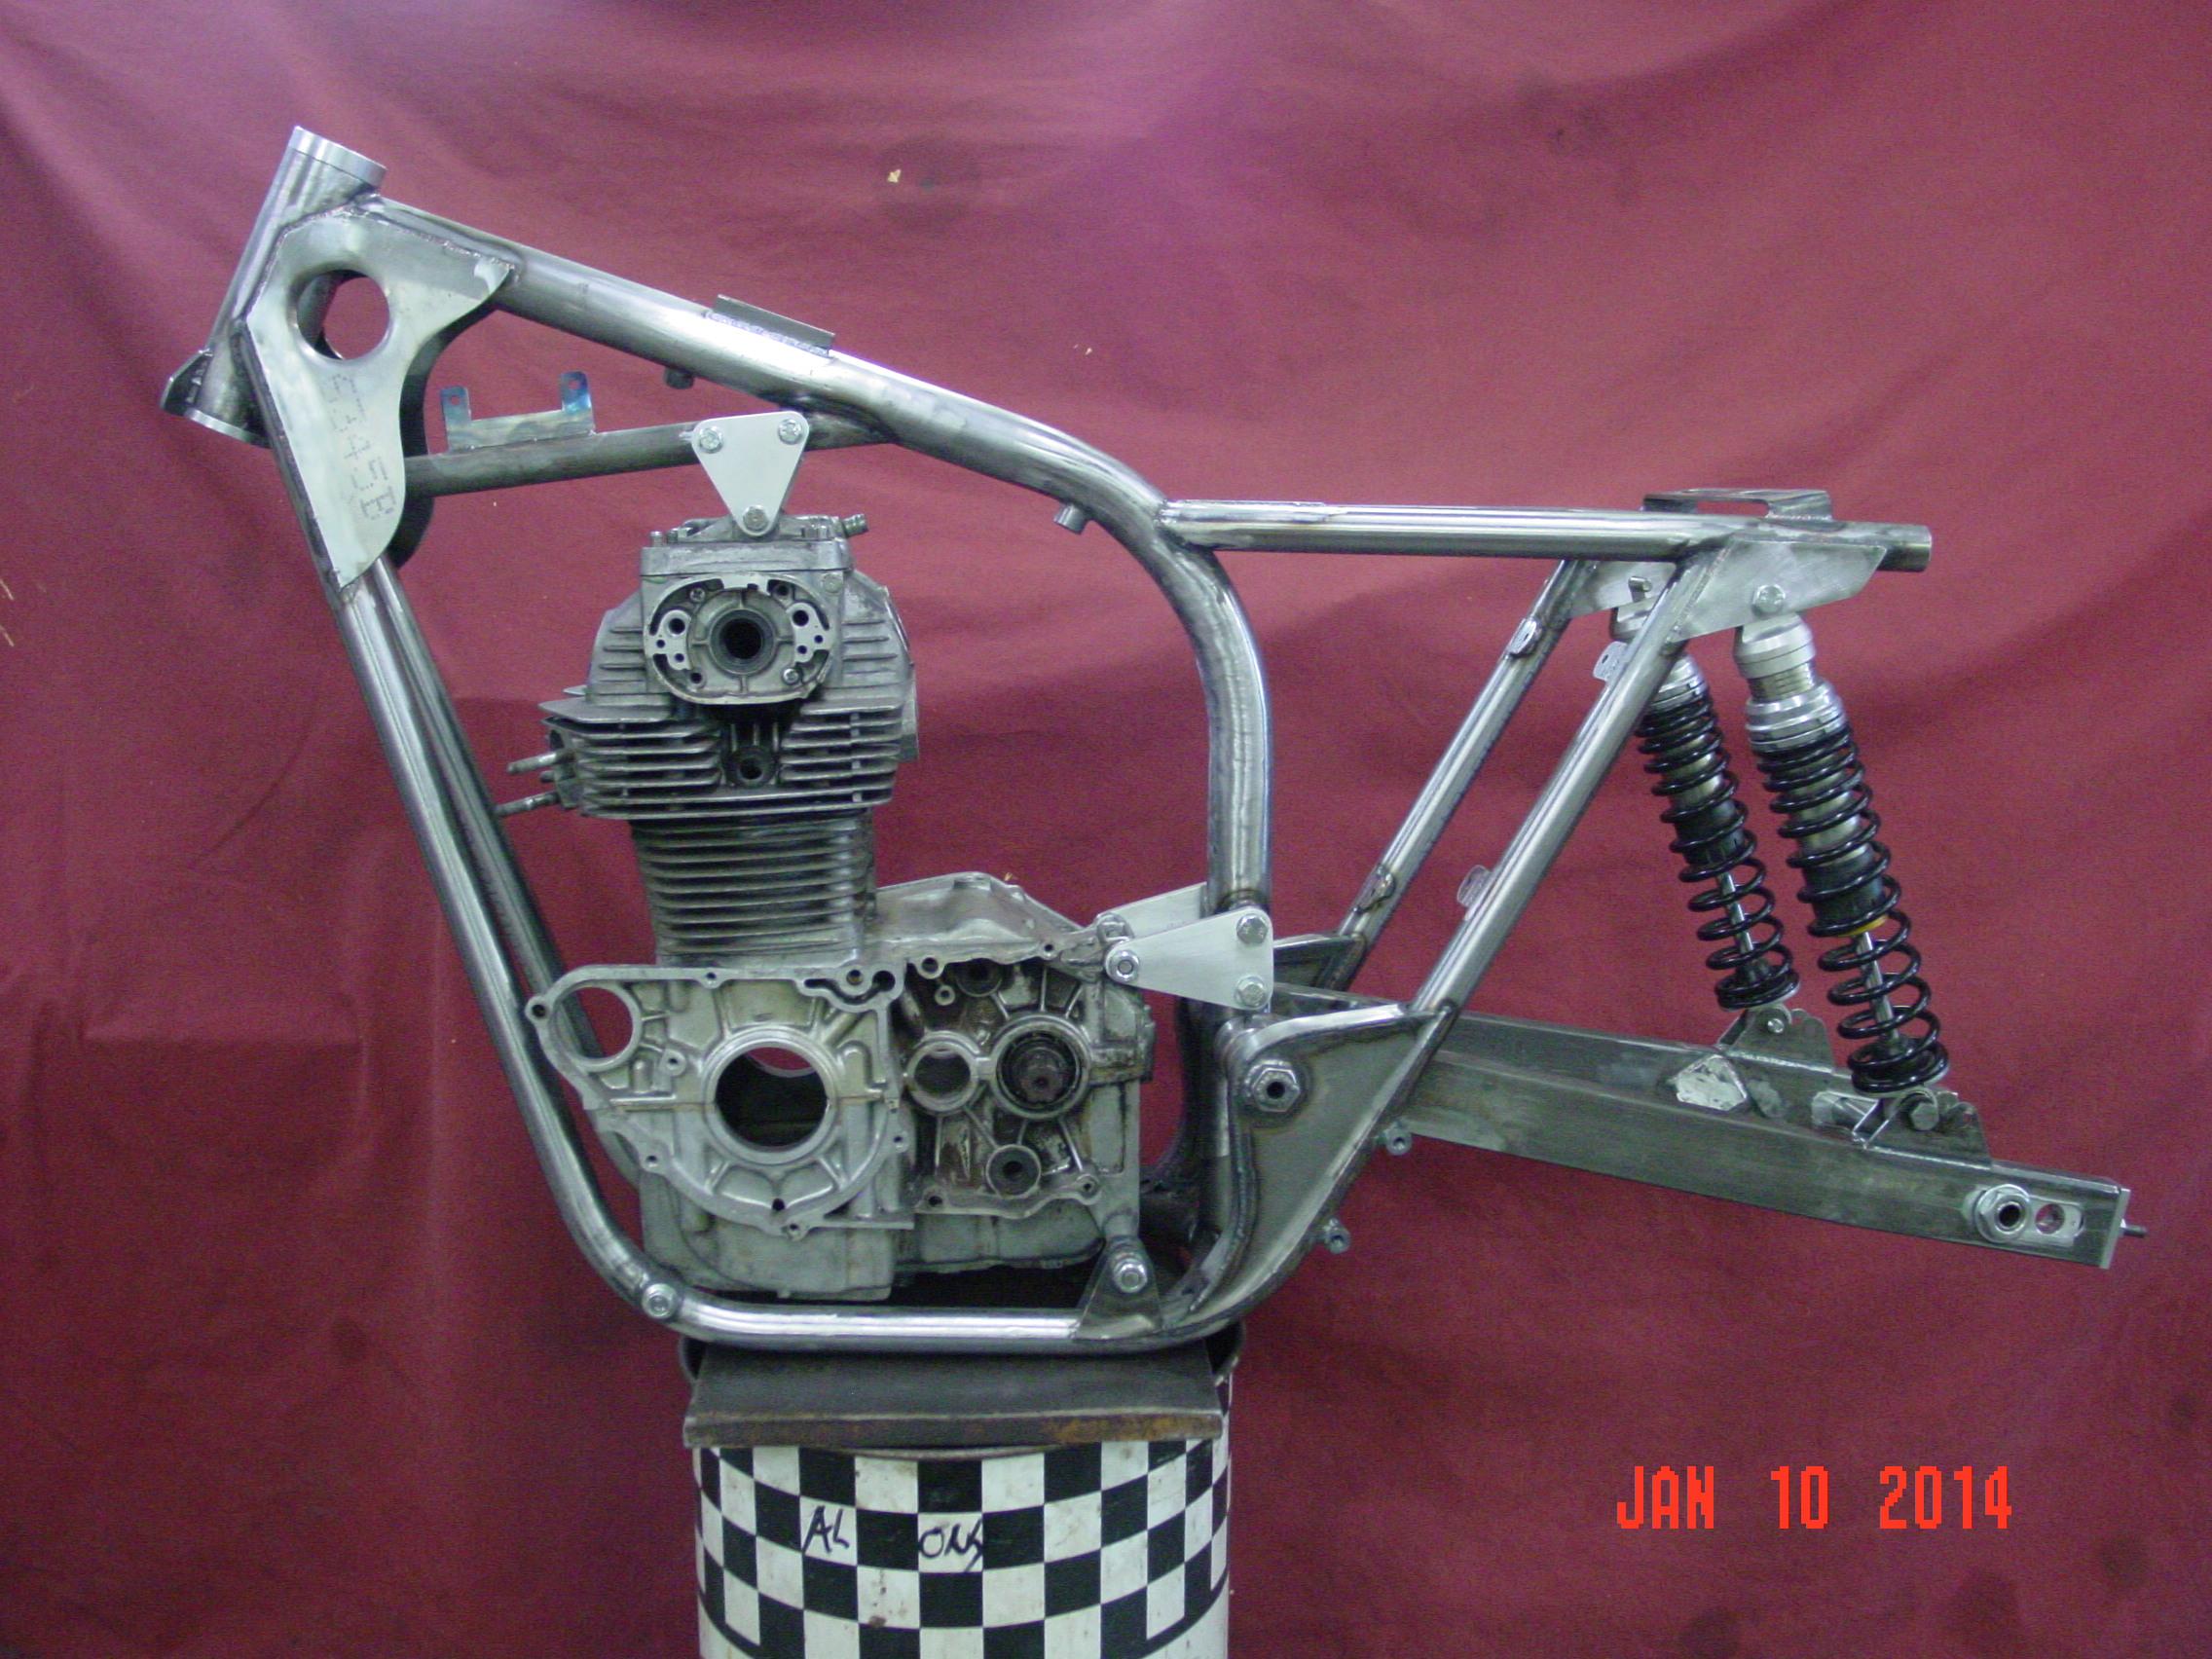 Honda Of Bellevue >> Framecrafters Trackmaster Style Frame for Honda CB/CL/SL Engine